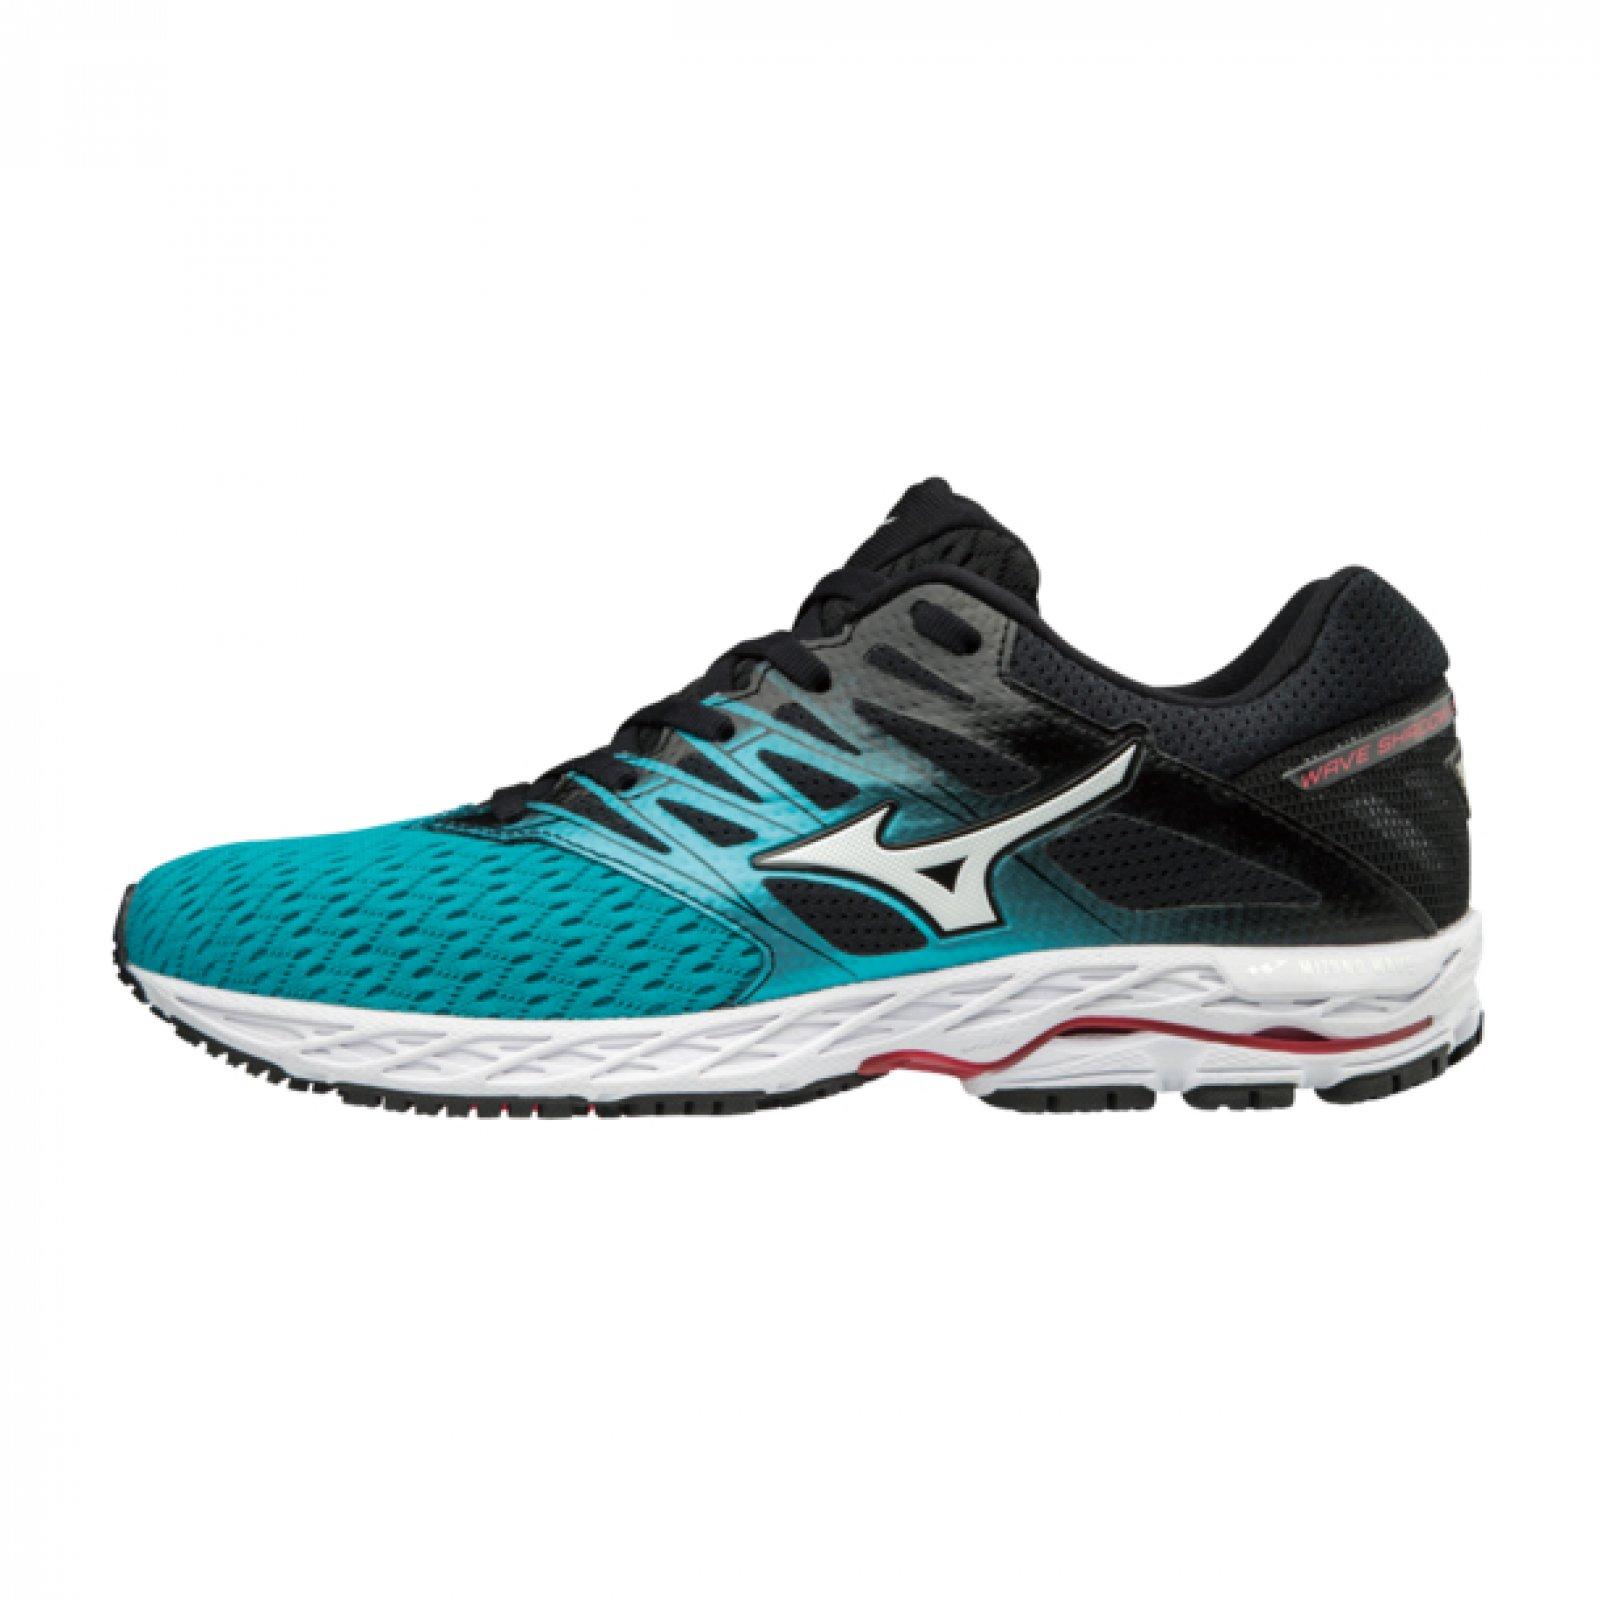 Silniční běžecká obuv Mizuno Wave Shadow 2 W J1GD183001 - Actisport.cz 5b29e1c6fd